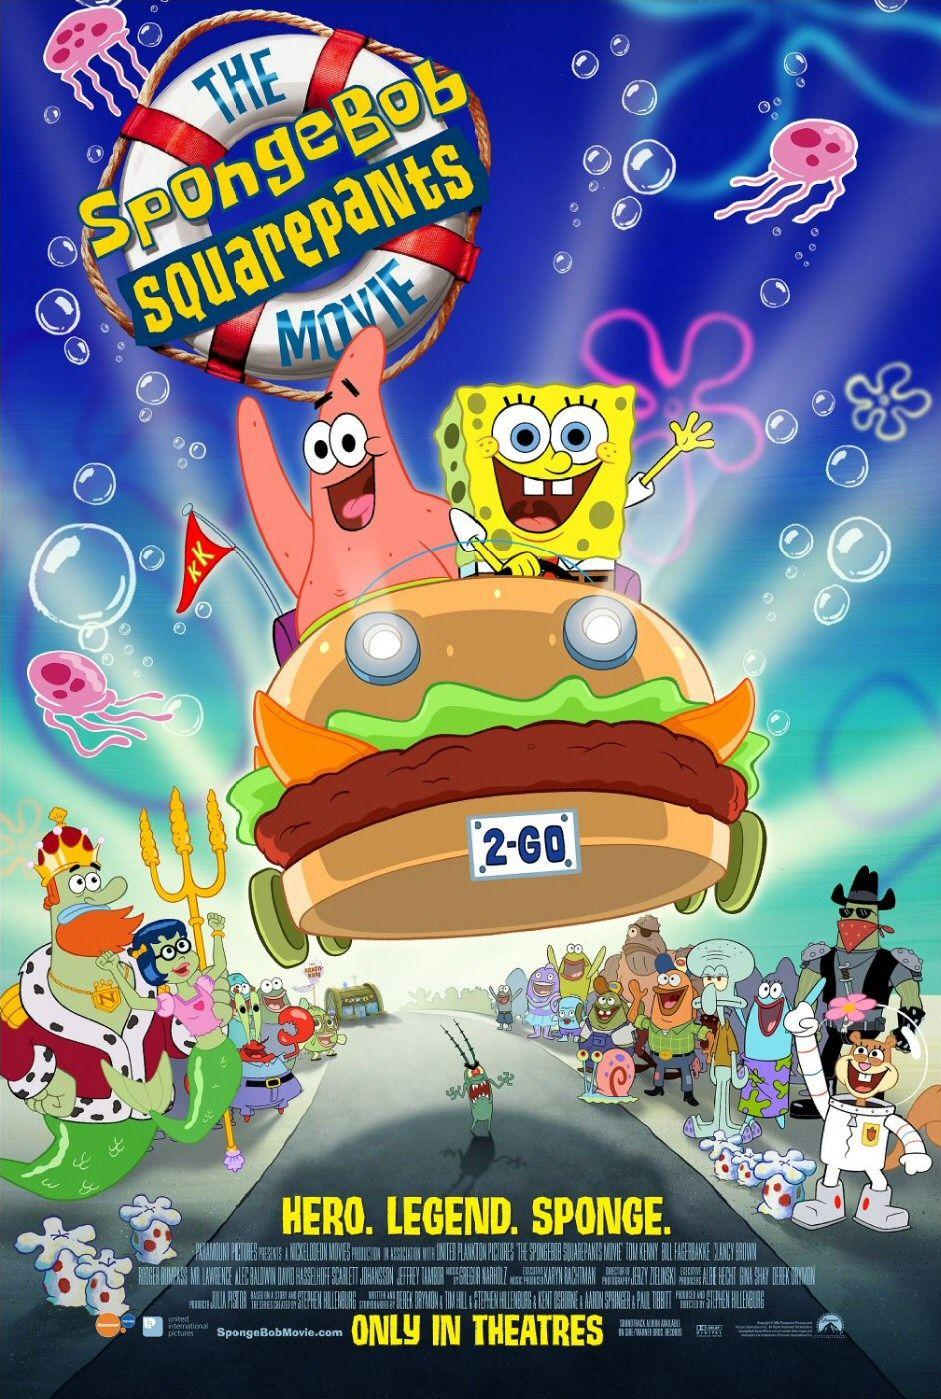 The Spongebob Squarepants Movie 2004 Matt damon, melanie lynskey, clancy brown, frank welker, scott bakula. the spongebob squarepants movie 2004